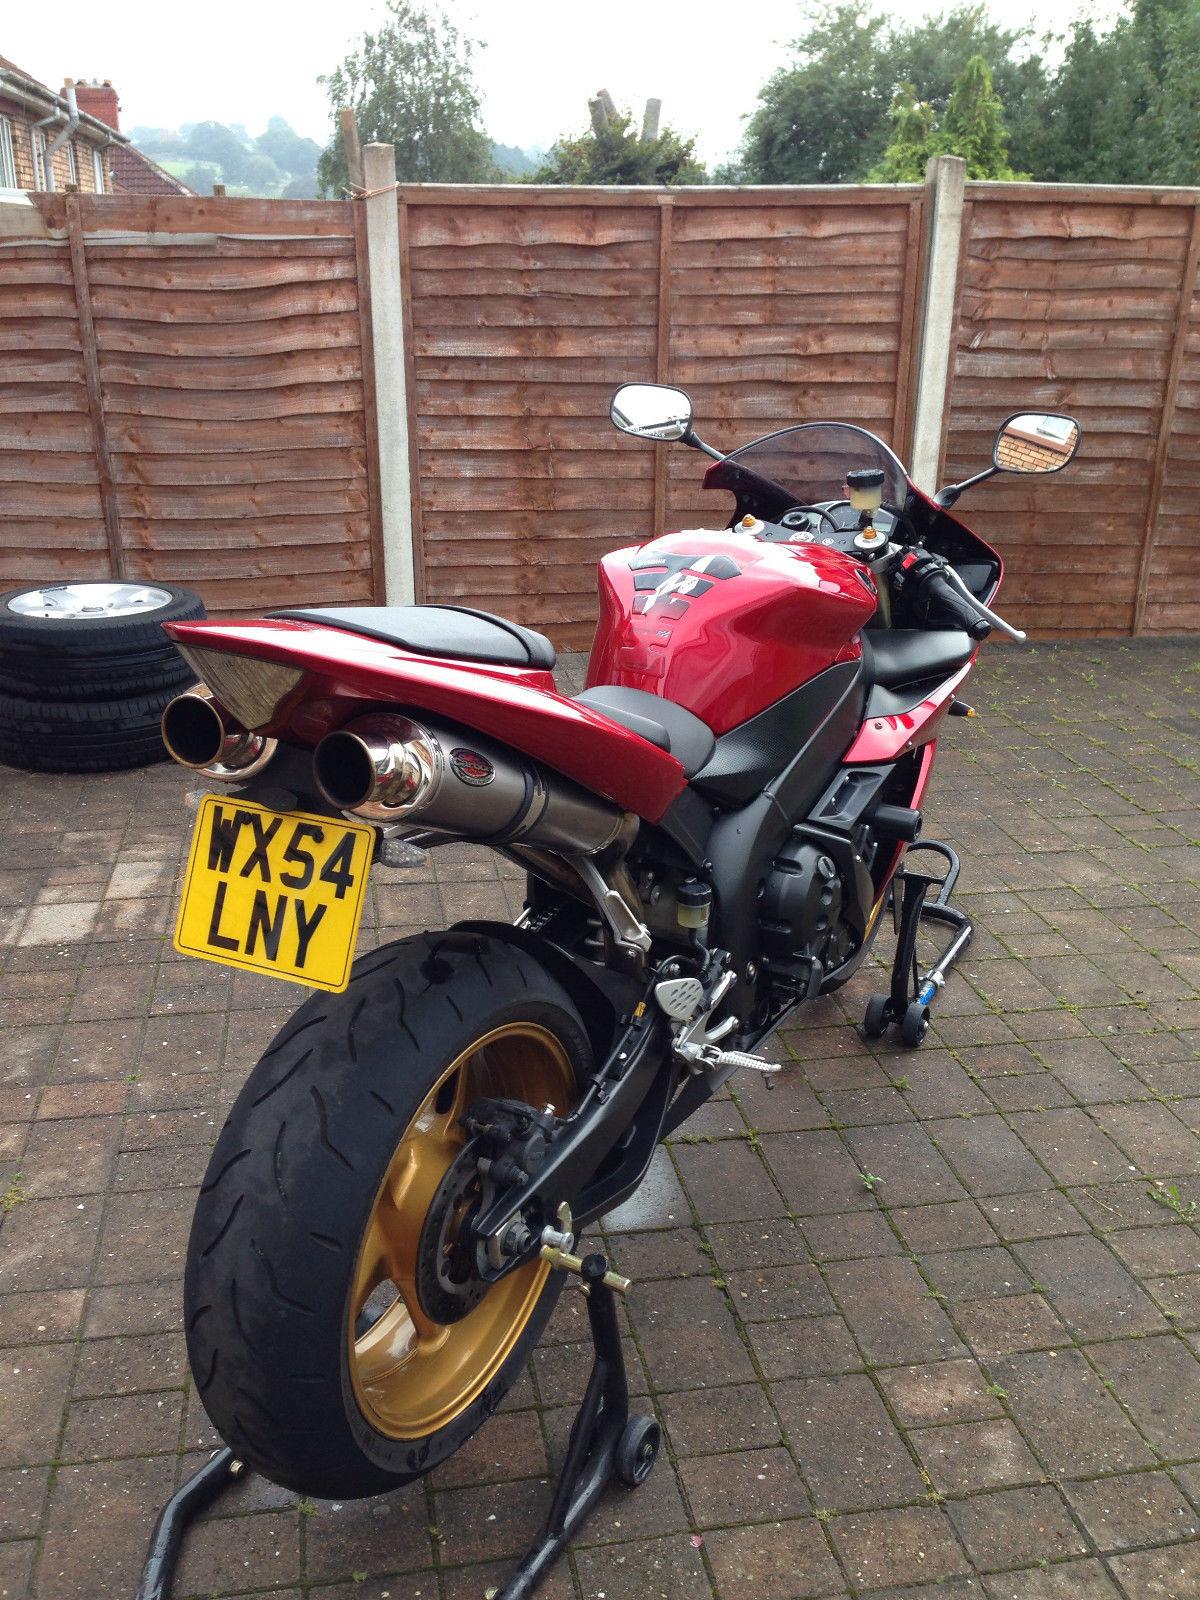 2004 Yamaha Yzf R1 04 Red